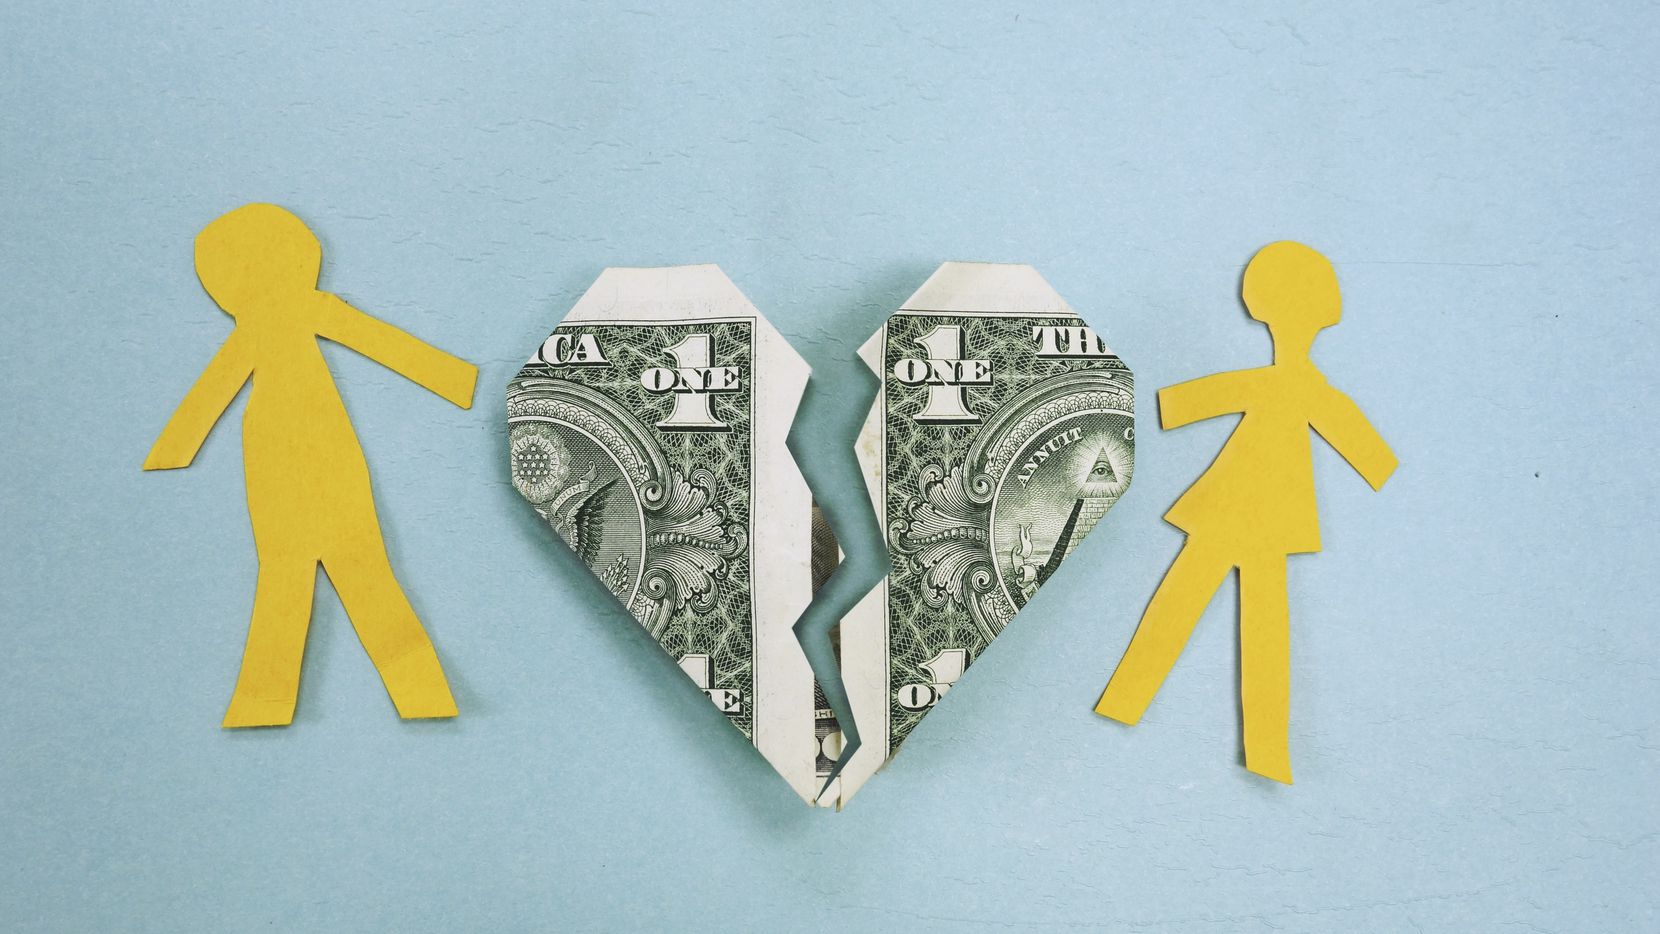 Paper couple and broken dollar heart - divorce or money trouble concept